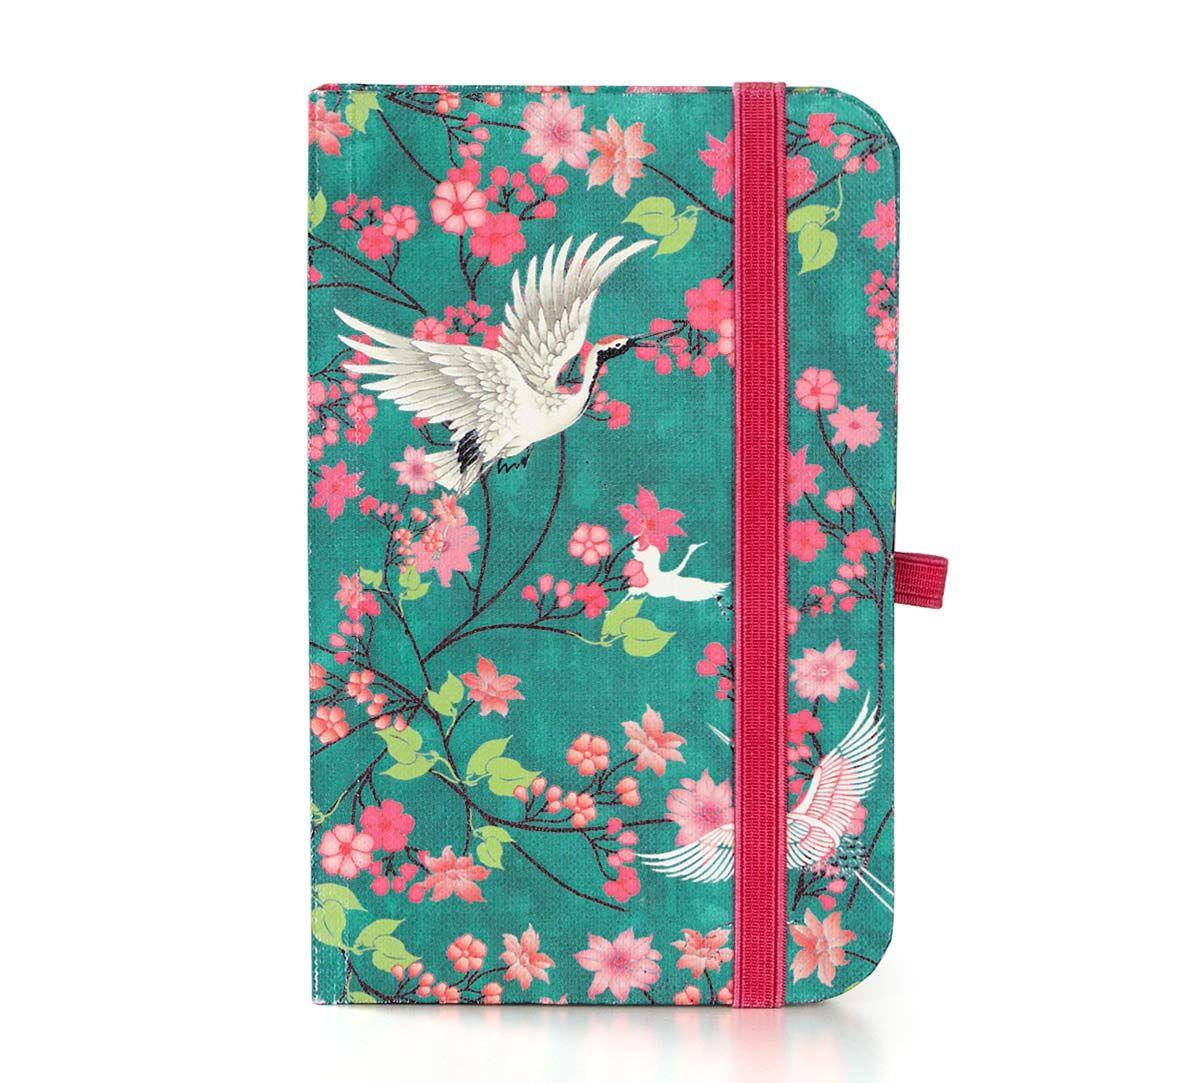 India Circus Flight of Cranes Pocket Diary